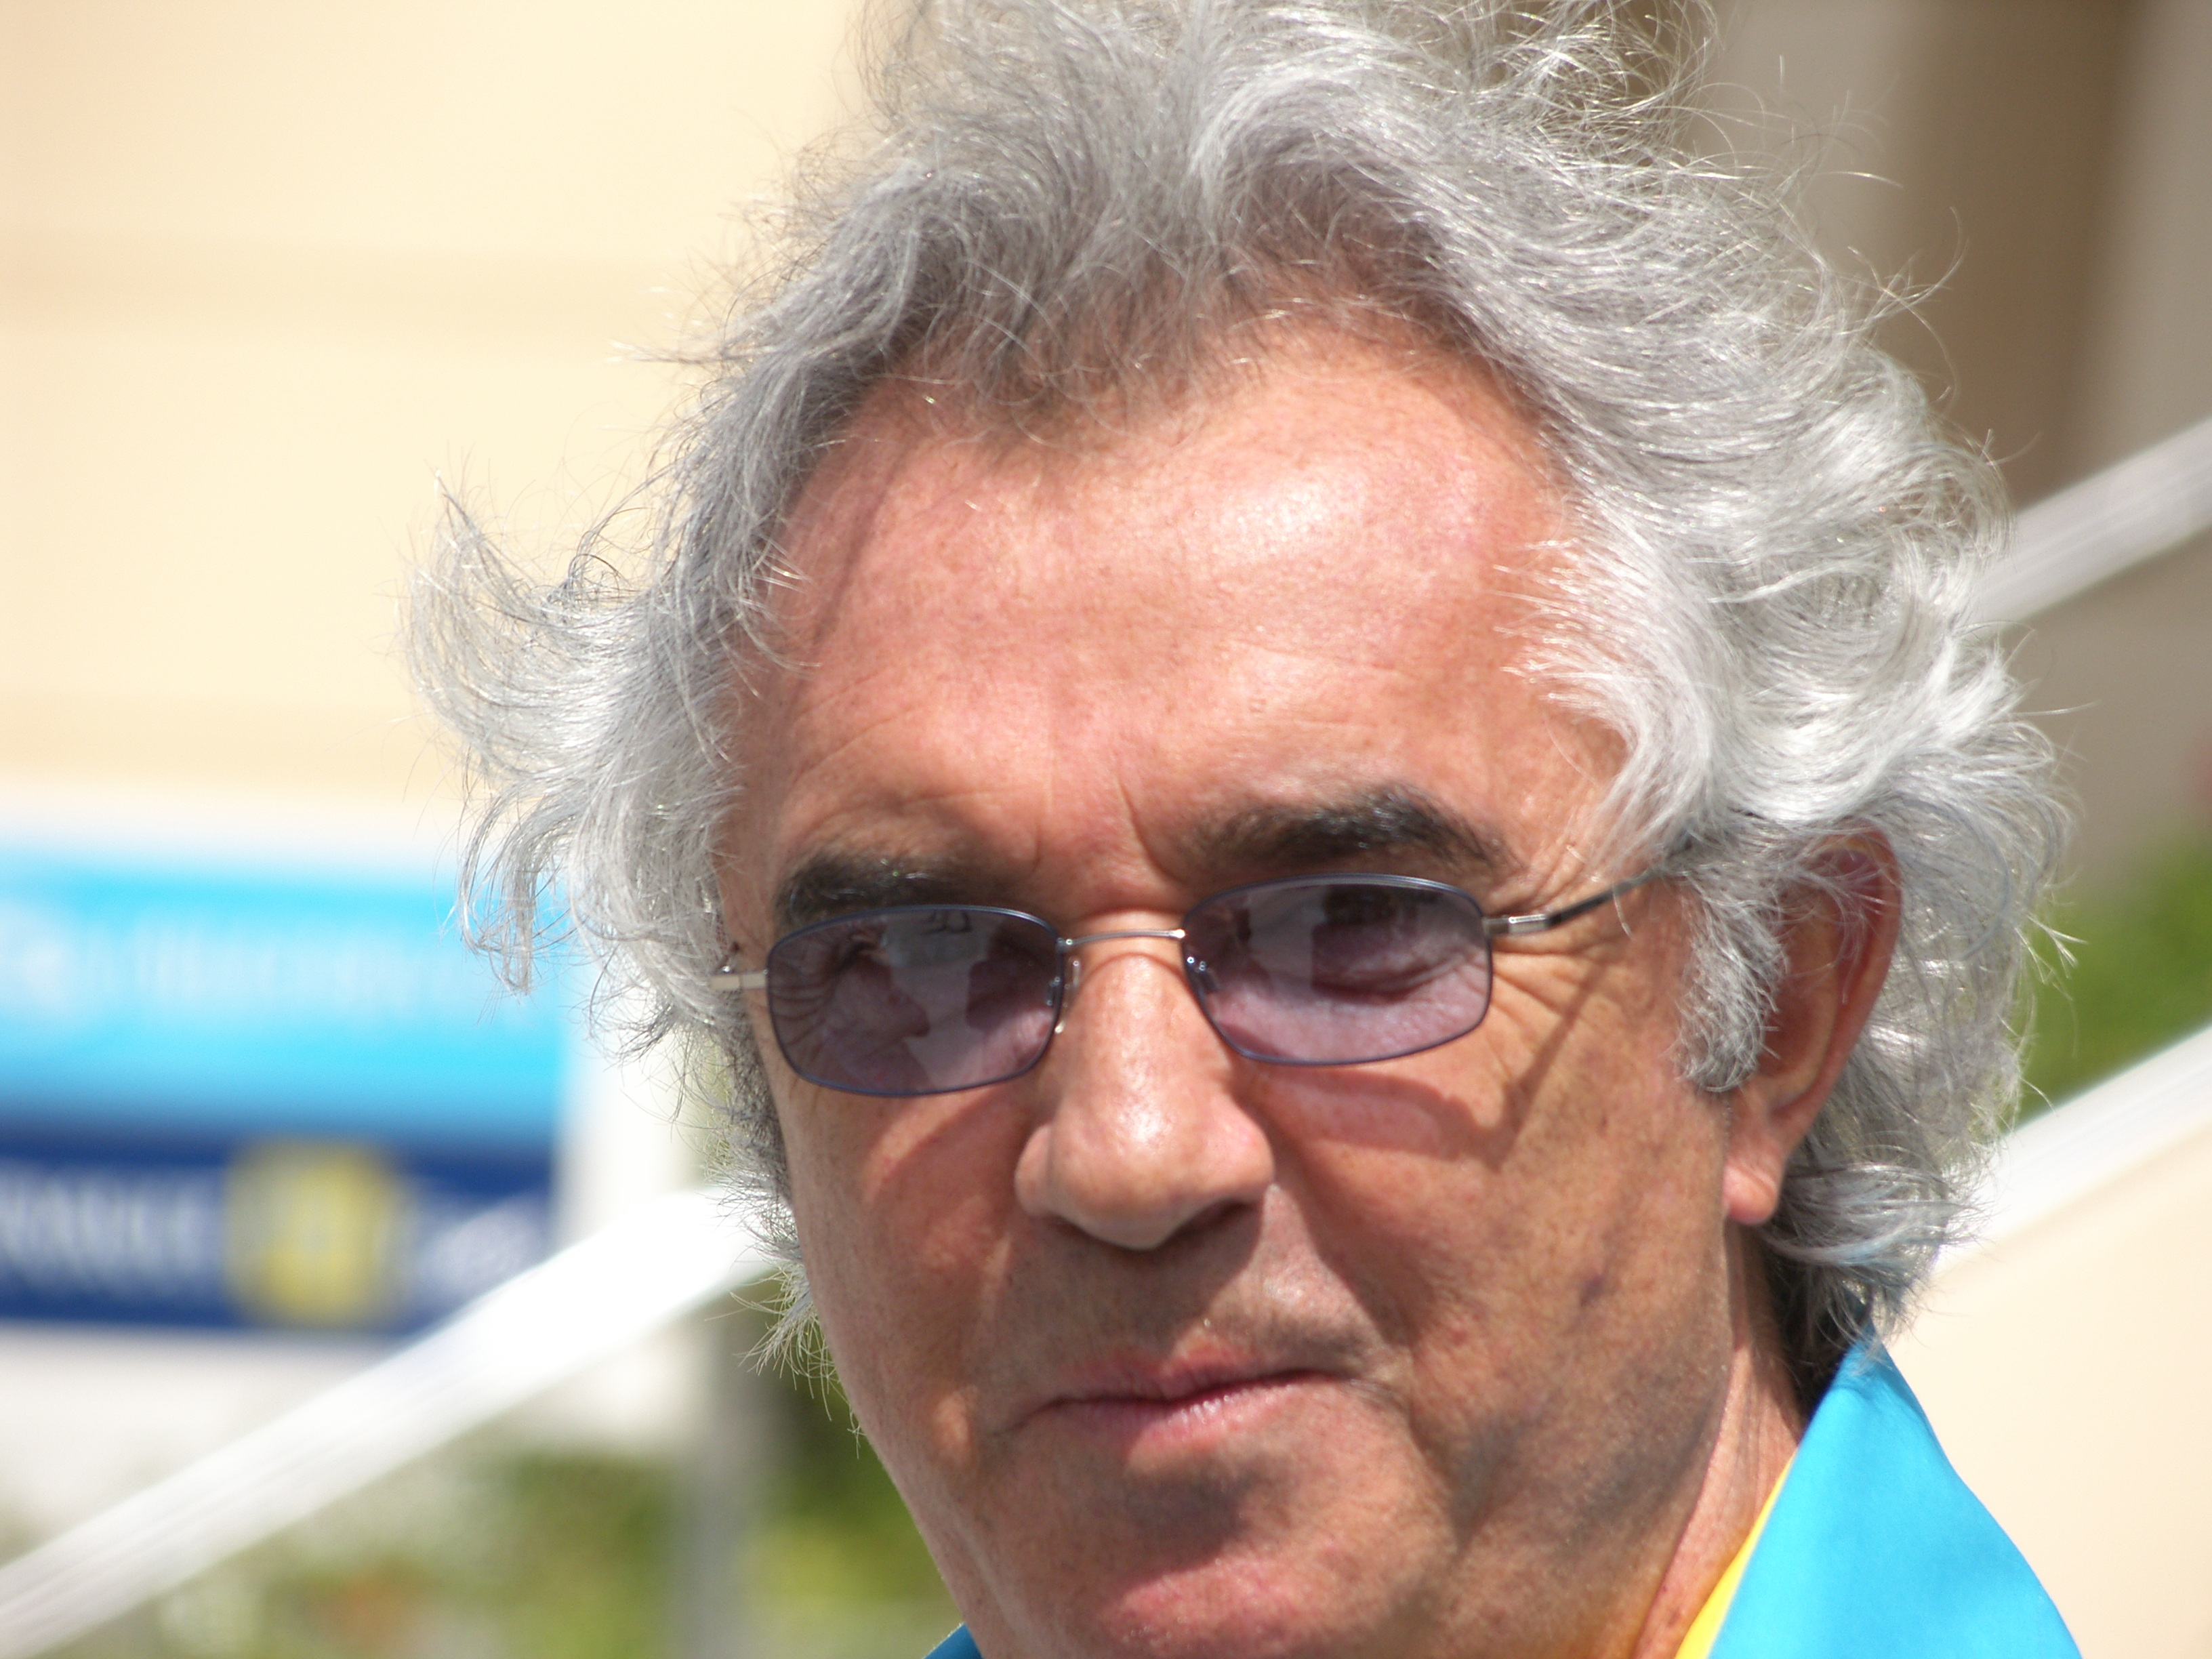 https://i1.wp.com/upload.wikimedia.org/wikipedia/commons/8/8a/Flavio_Briatore.JPG